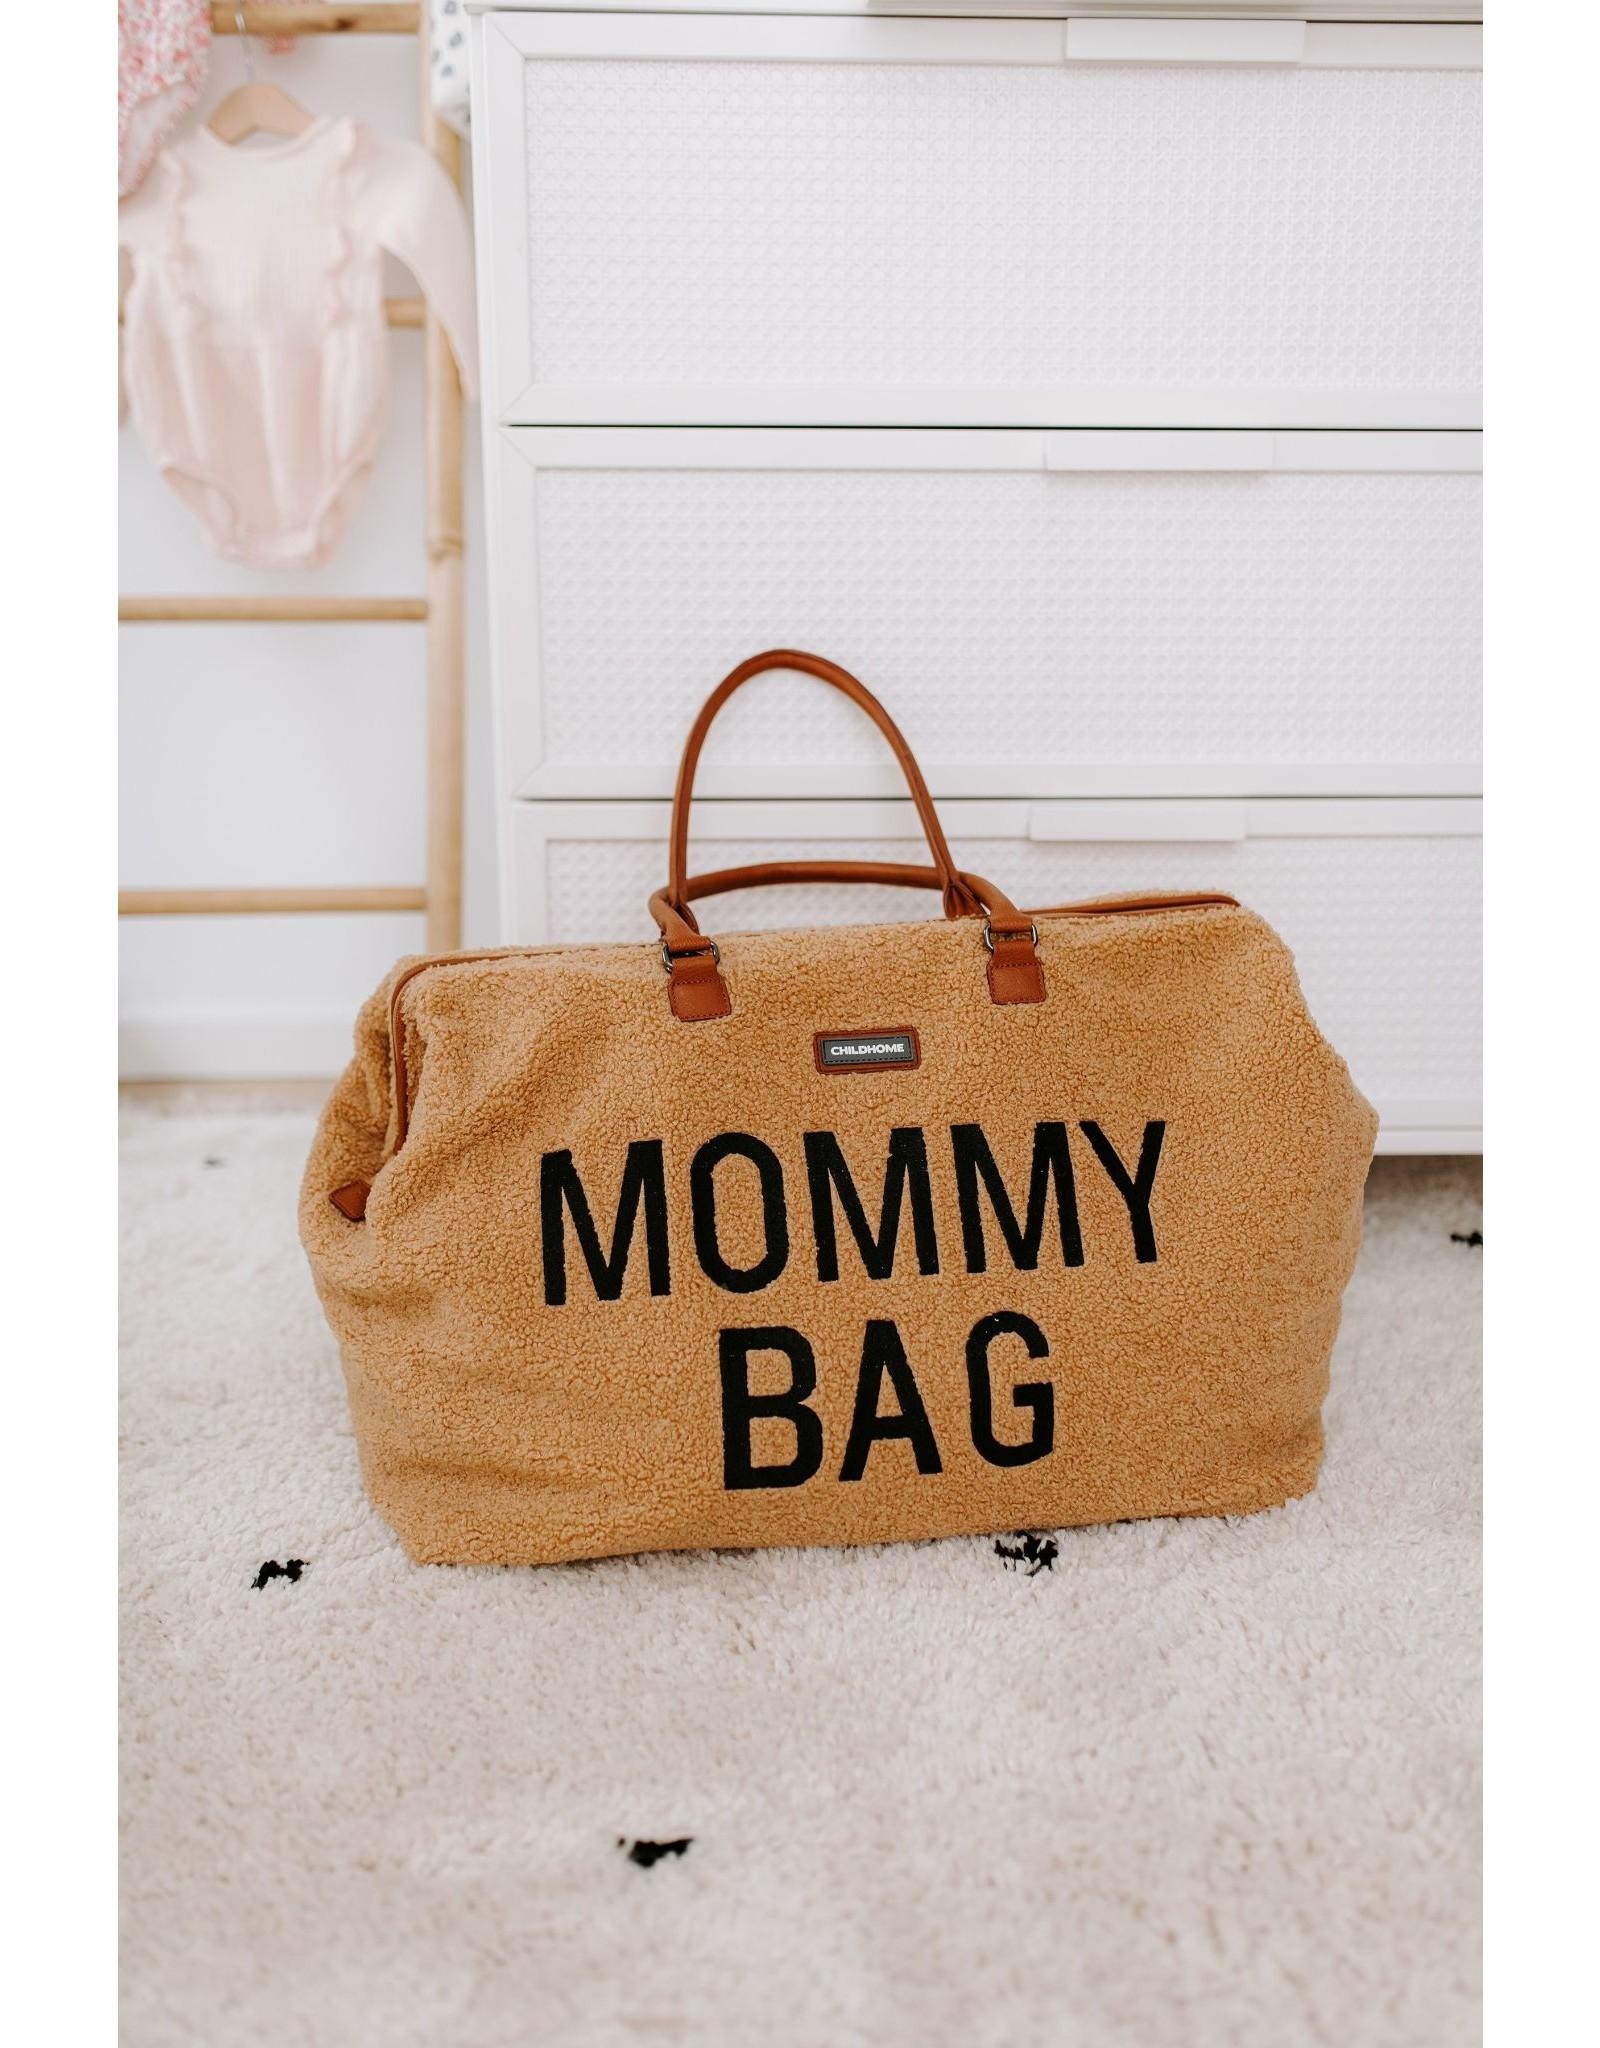 Childhome Mommy Bag - teddy camel